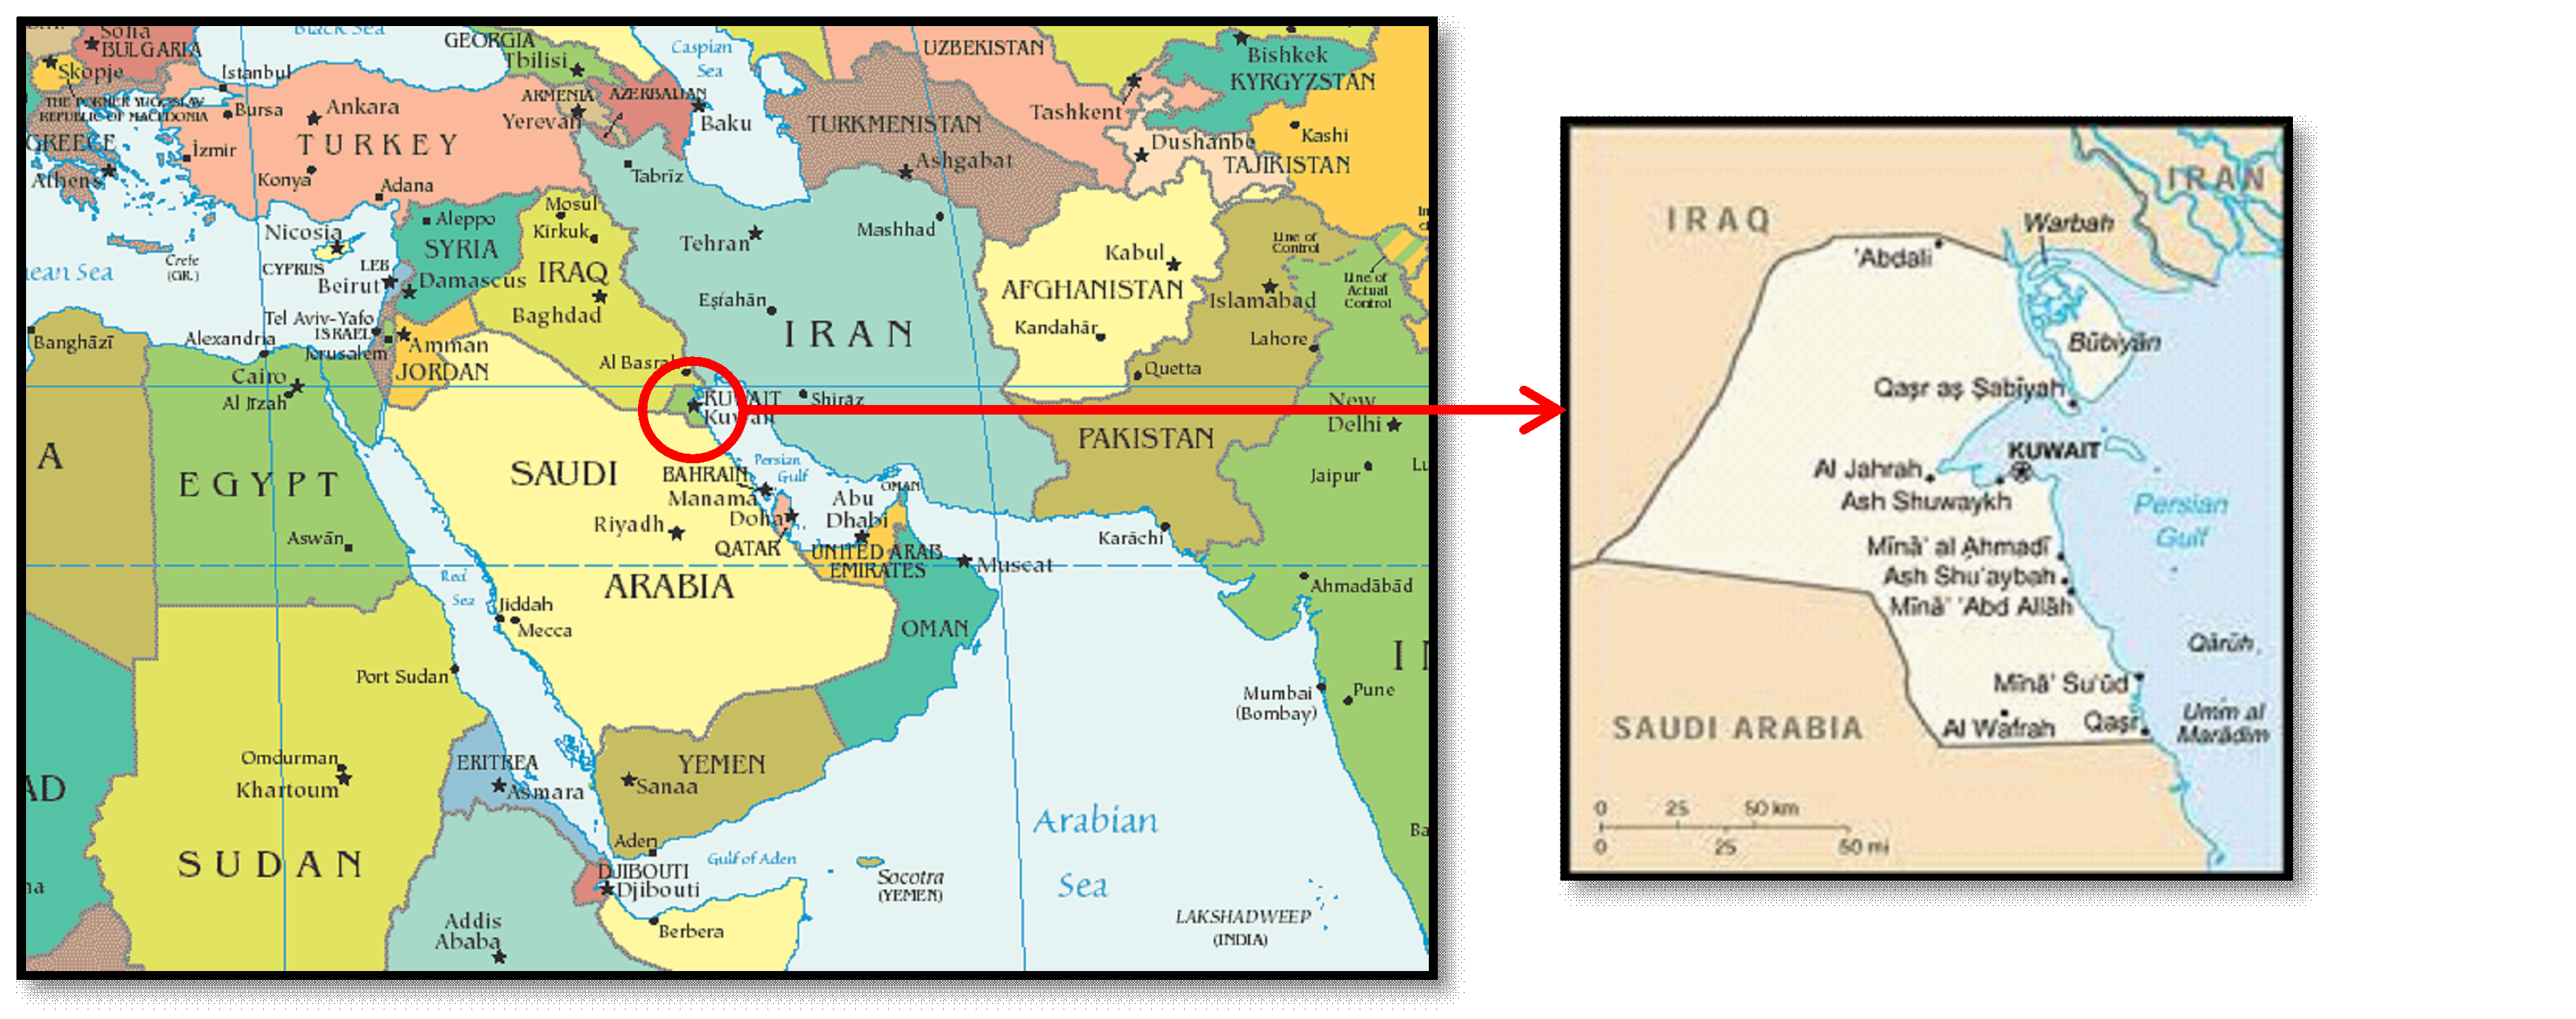 Kuwait State Map India State Map Lebanon State Map Antarctica - Kuwait map